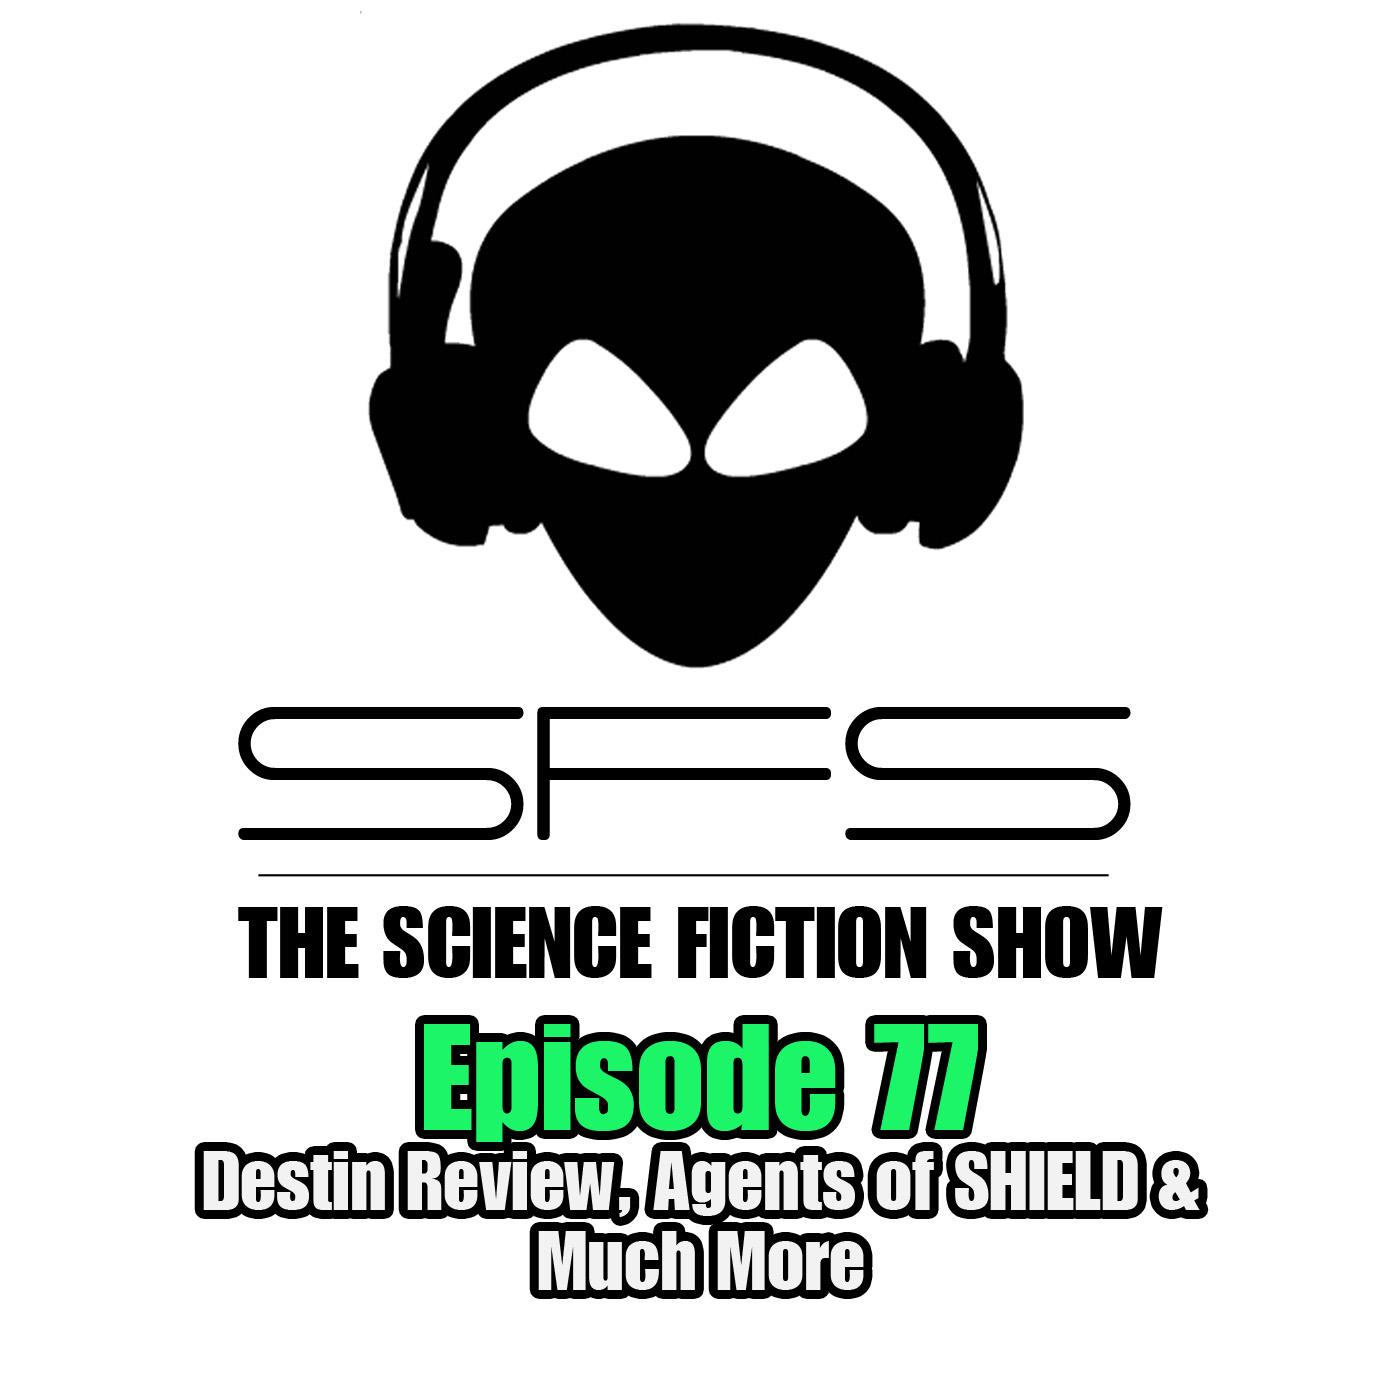 Episode 77: Destiny Review, Agents of SHIELD